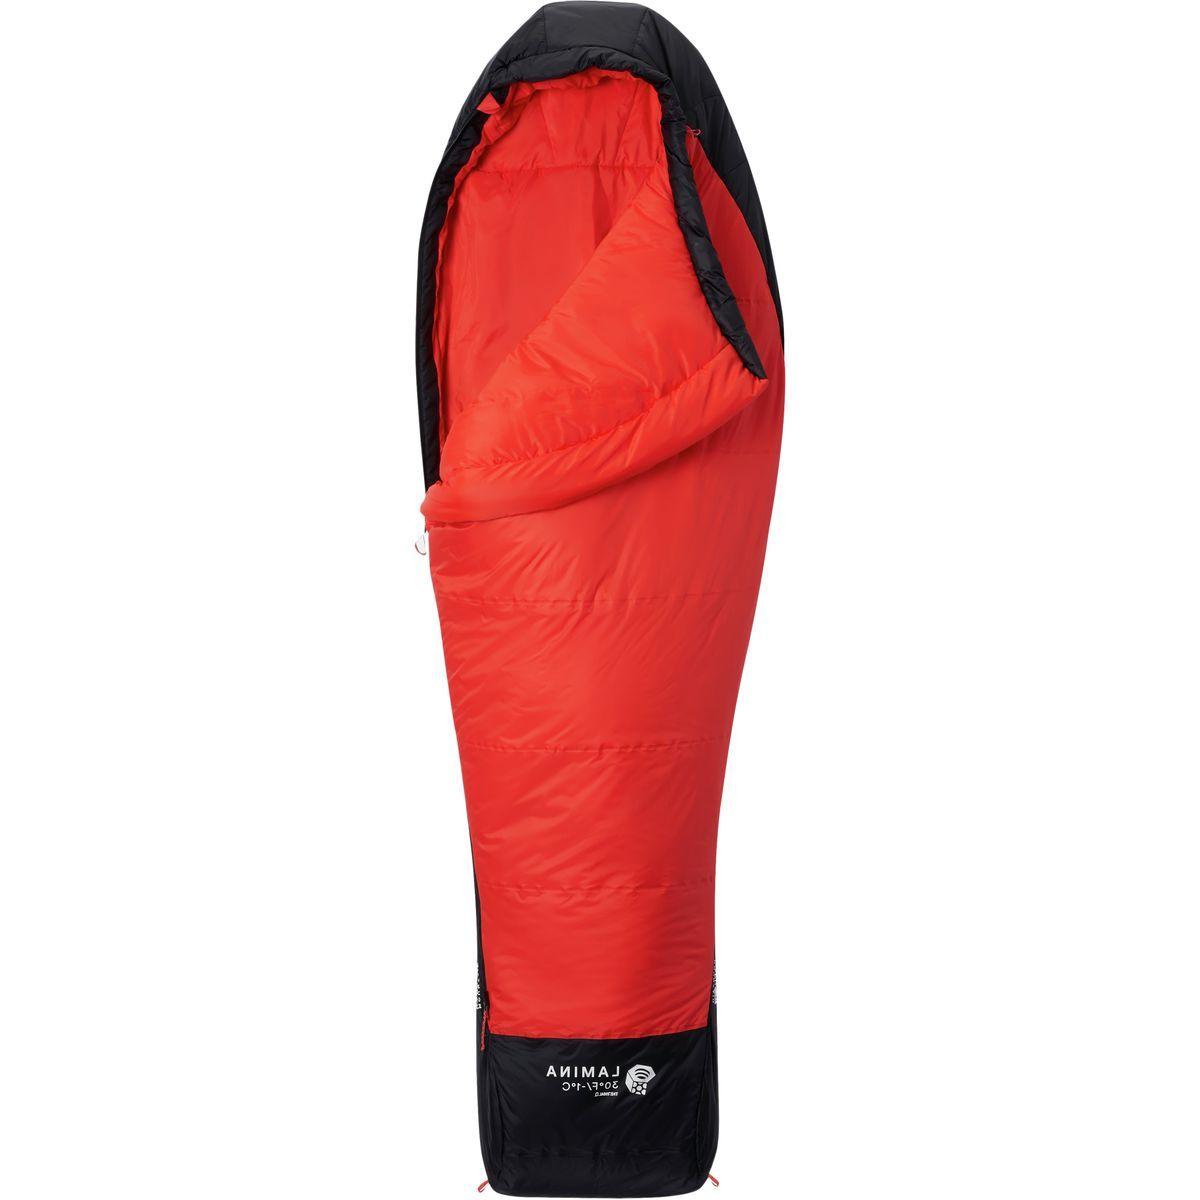 Mountain Hardwear Lamina Sleeping Bag: 30 Degree Synthetic - Women's